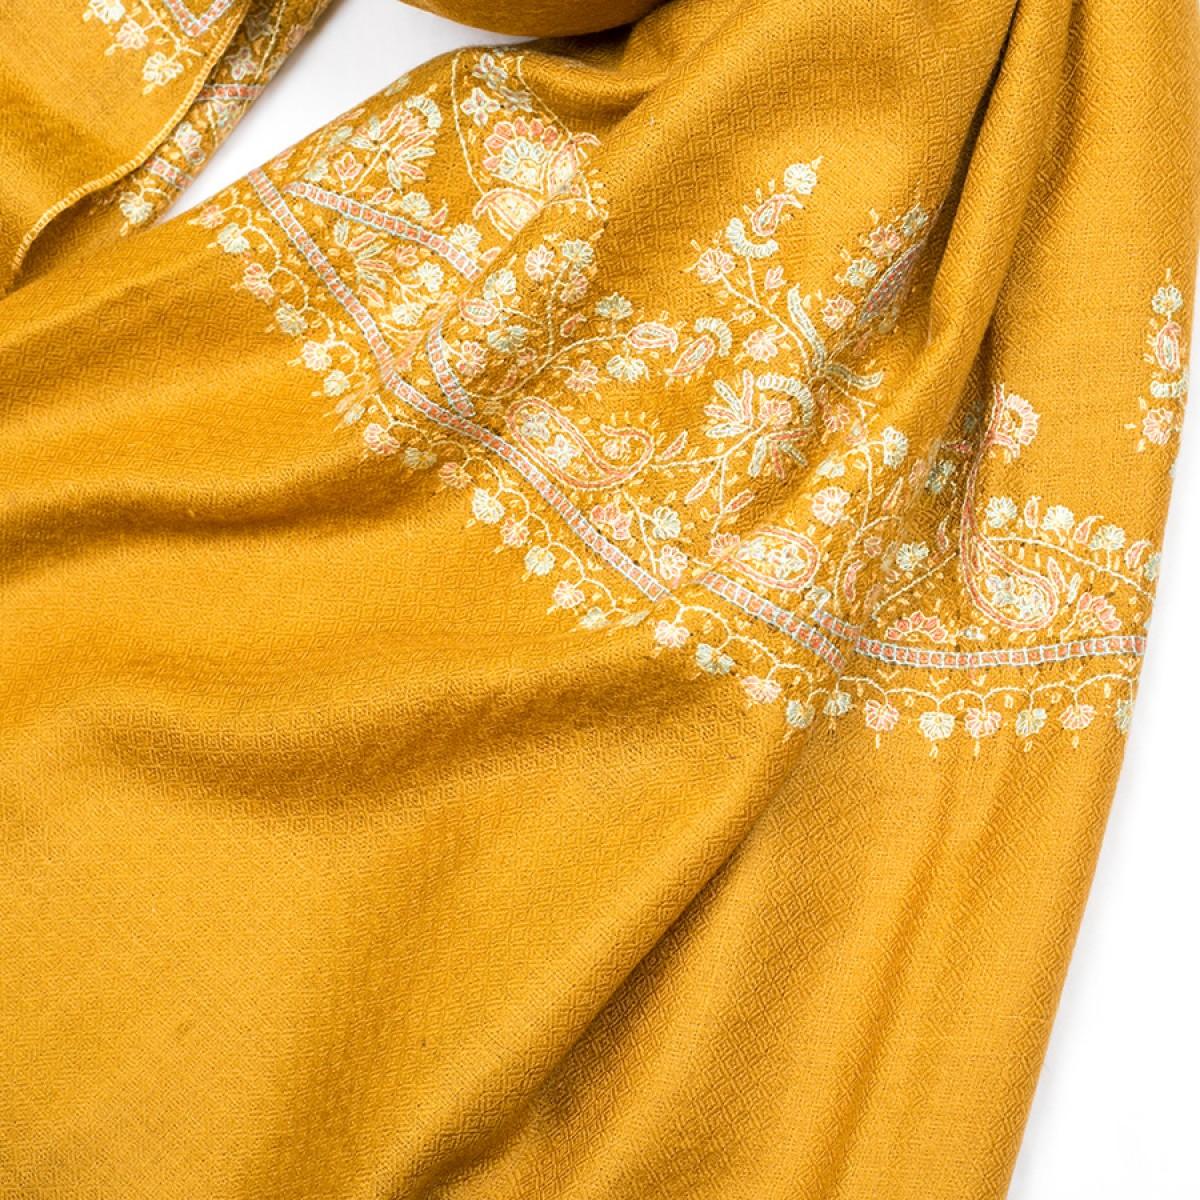 Embroidered Pashmina Shawl - Mustard